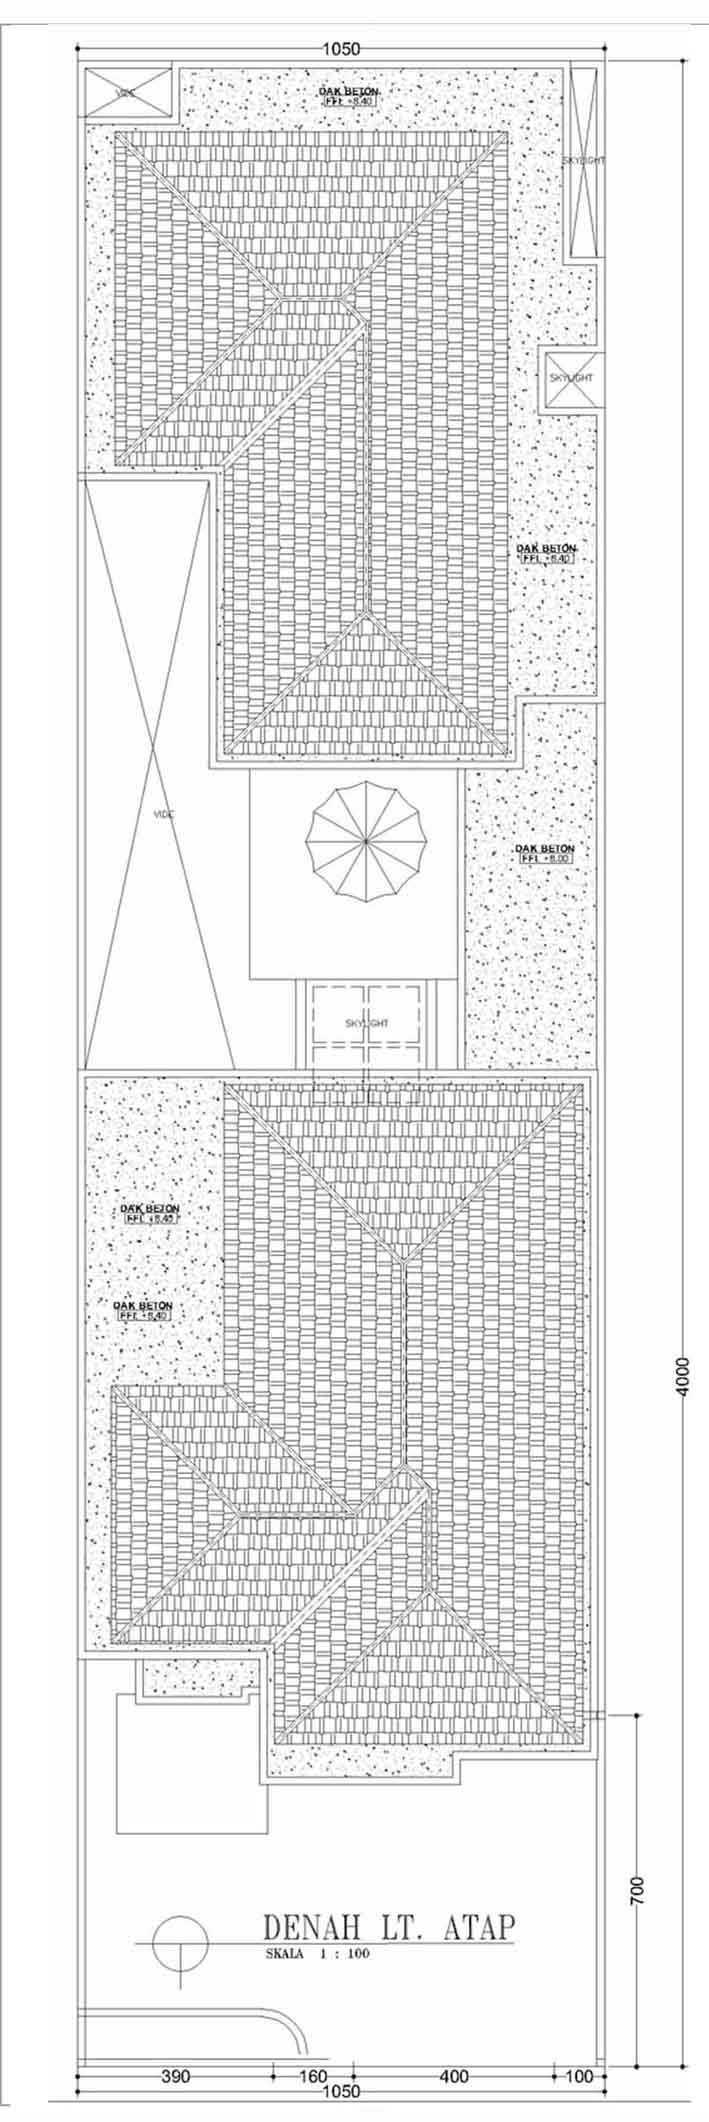 Faiz Rumah Klasik  At Tebet Tebet Jakarta Selatan  Tebet Jakarta Selatan  Rumah-Tebet-5   12124